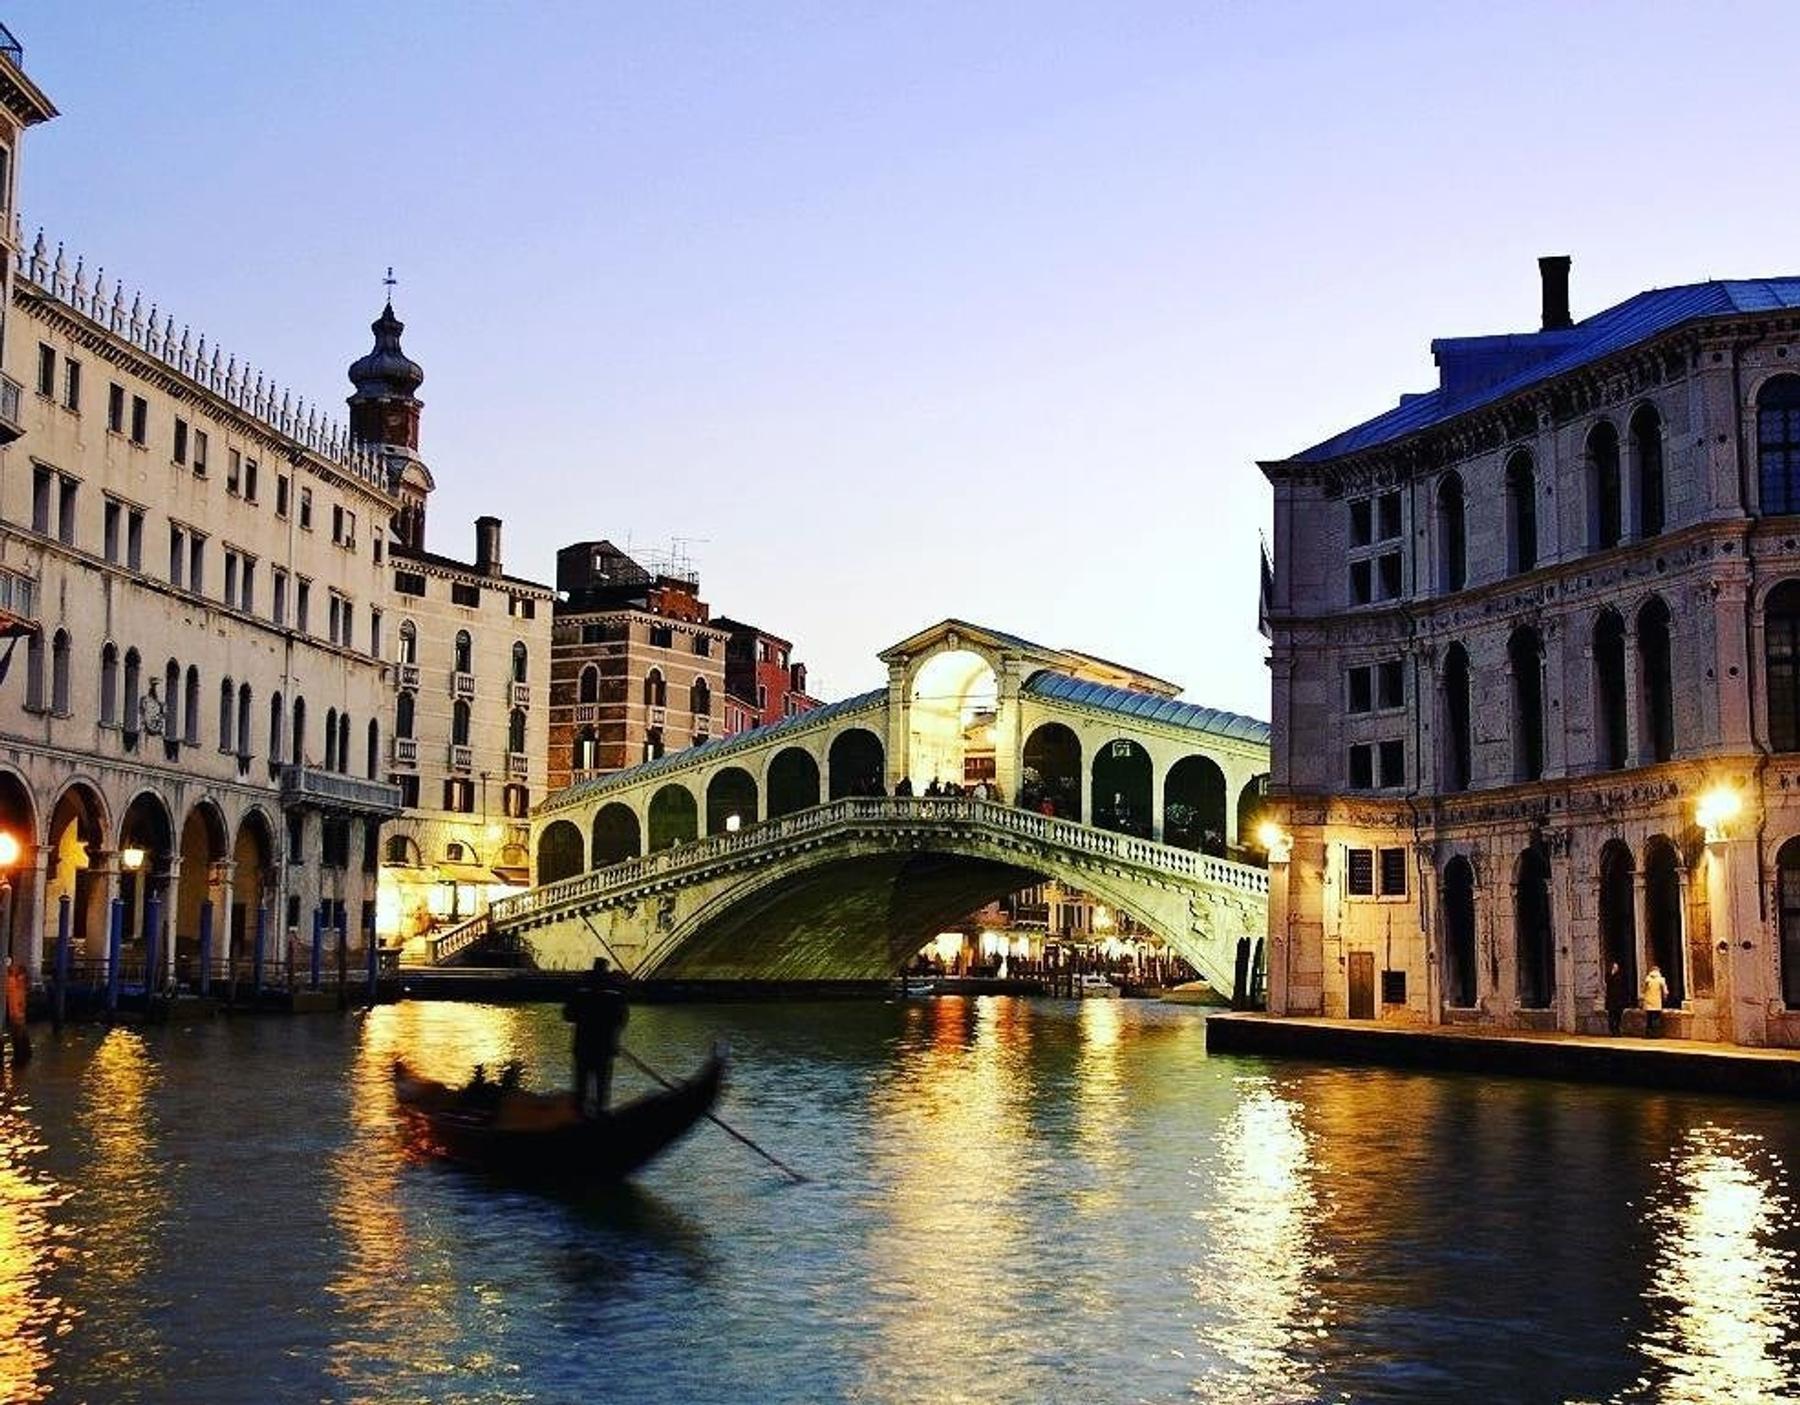 Posti da visitare in Italia: Venezia, Veneto